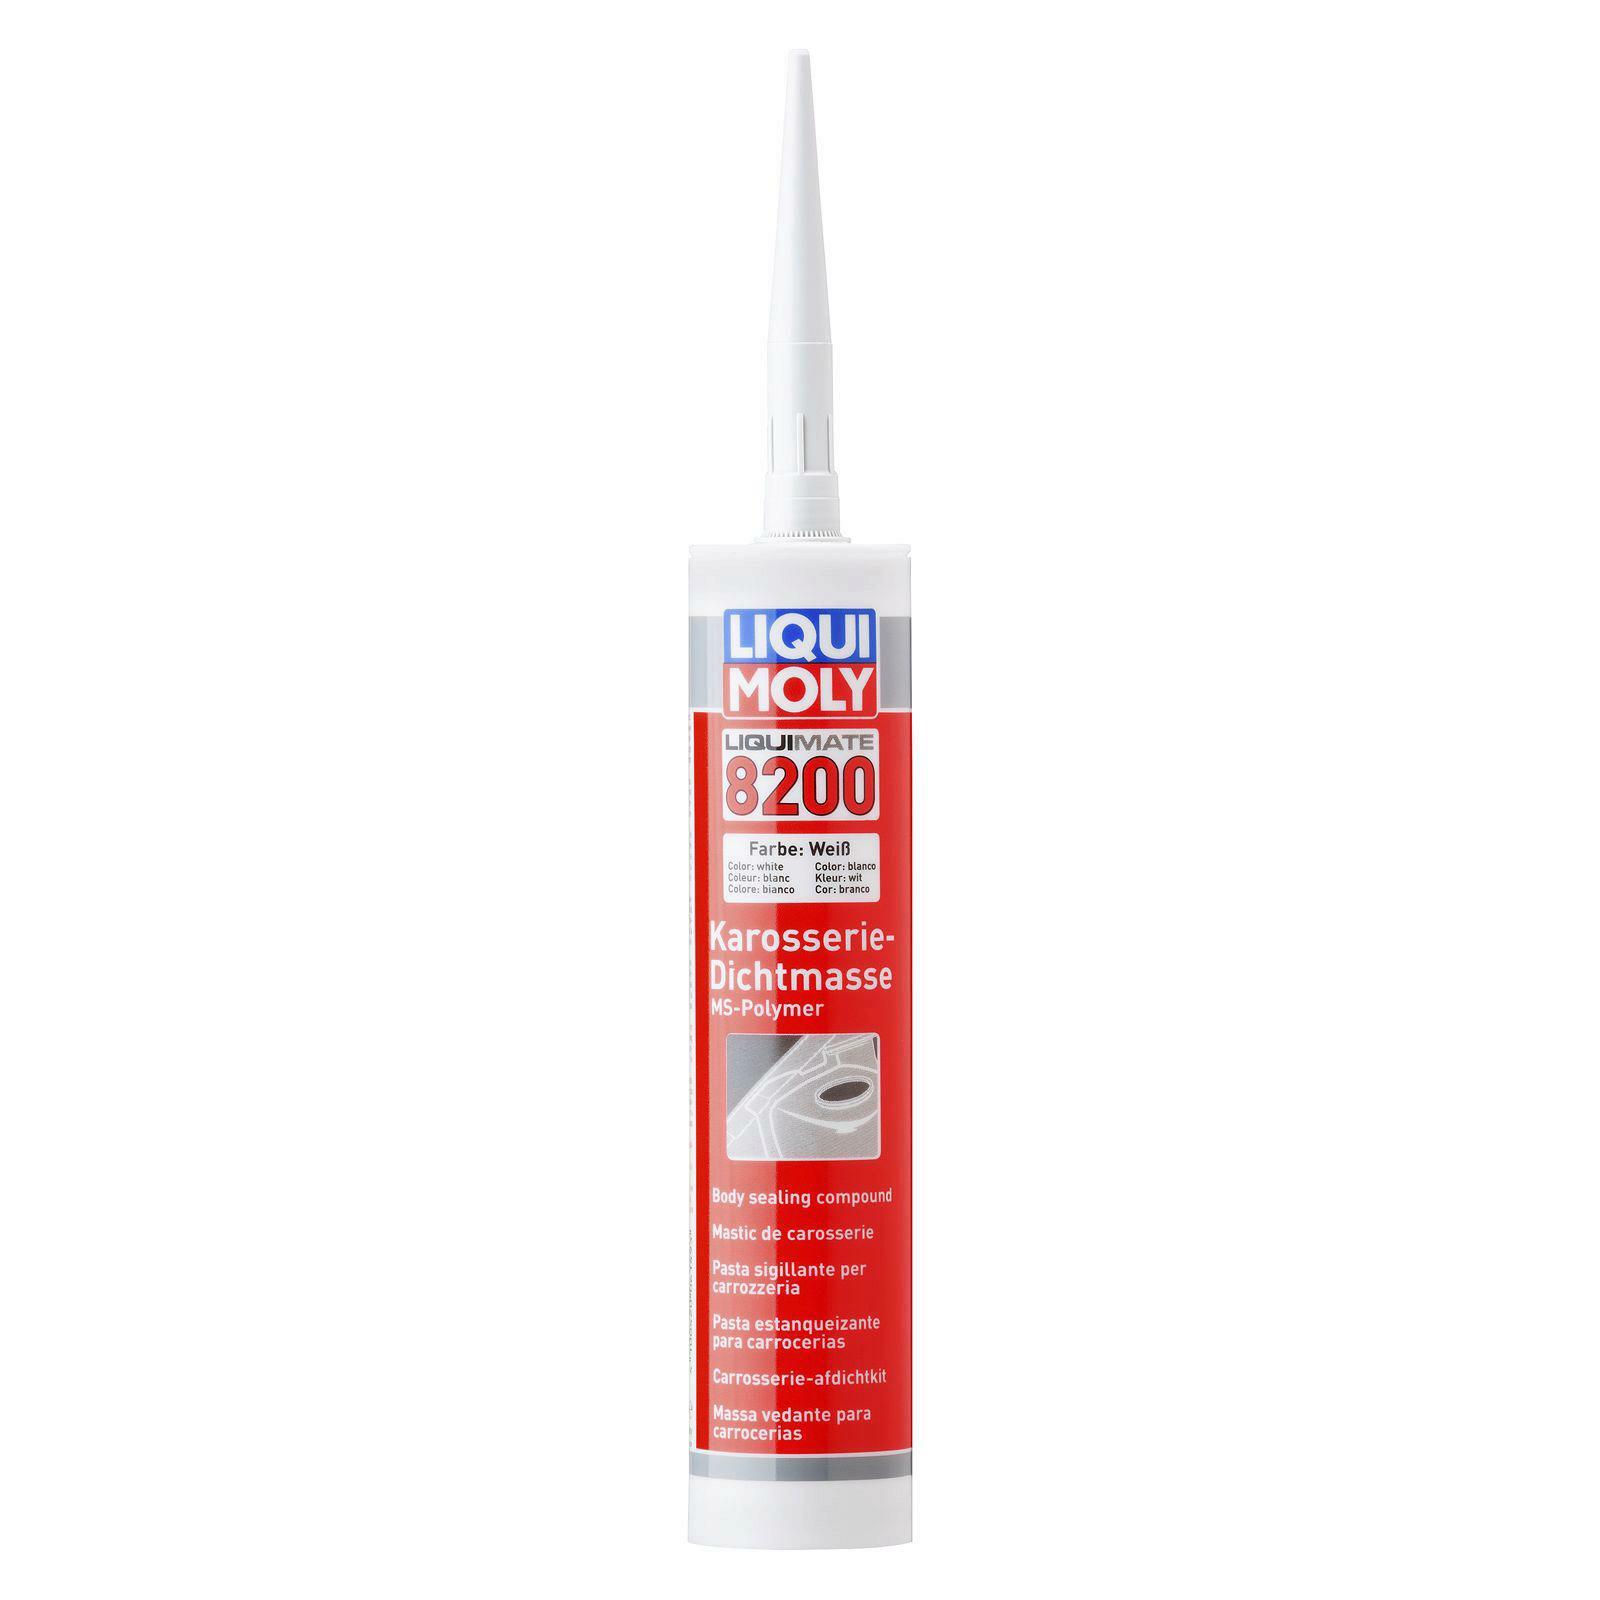 Liqui Moly Liquimate 8200 MS Polymer 290ml